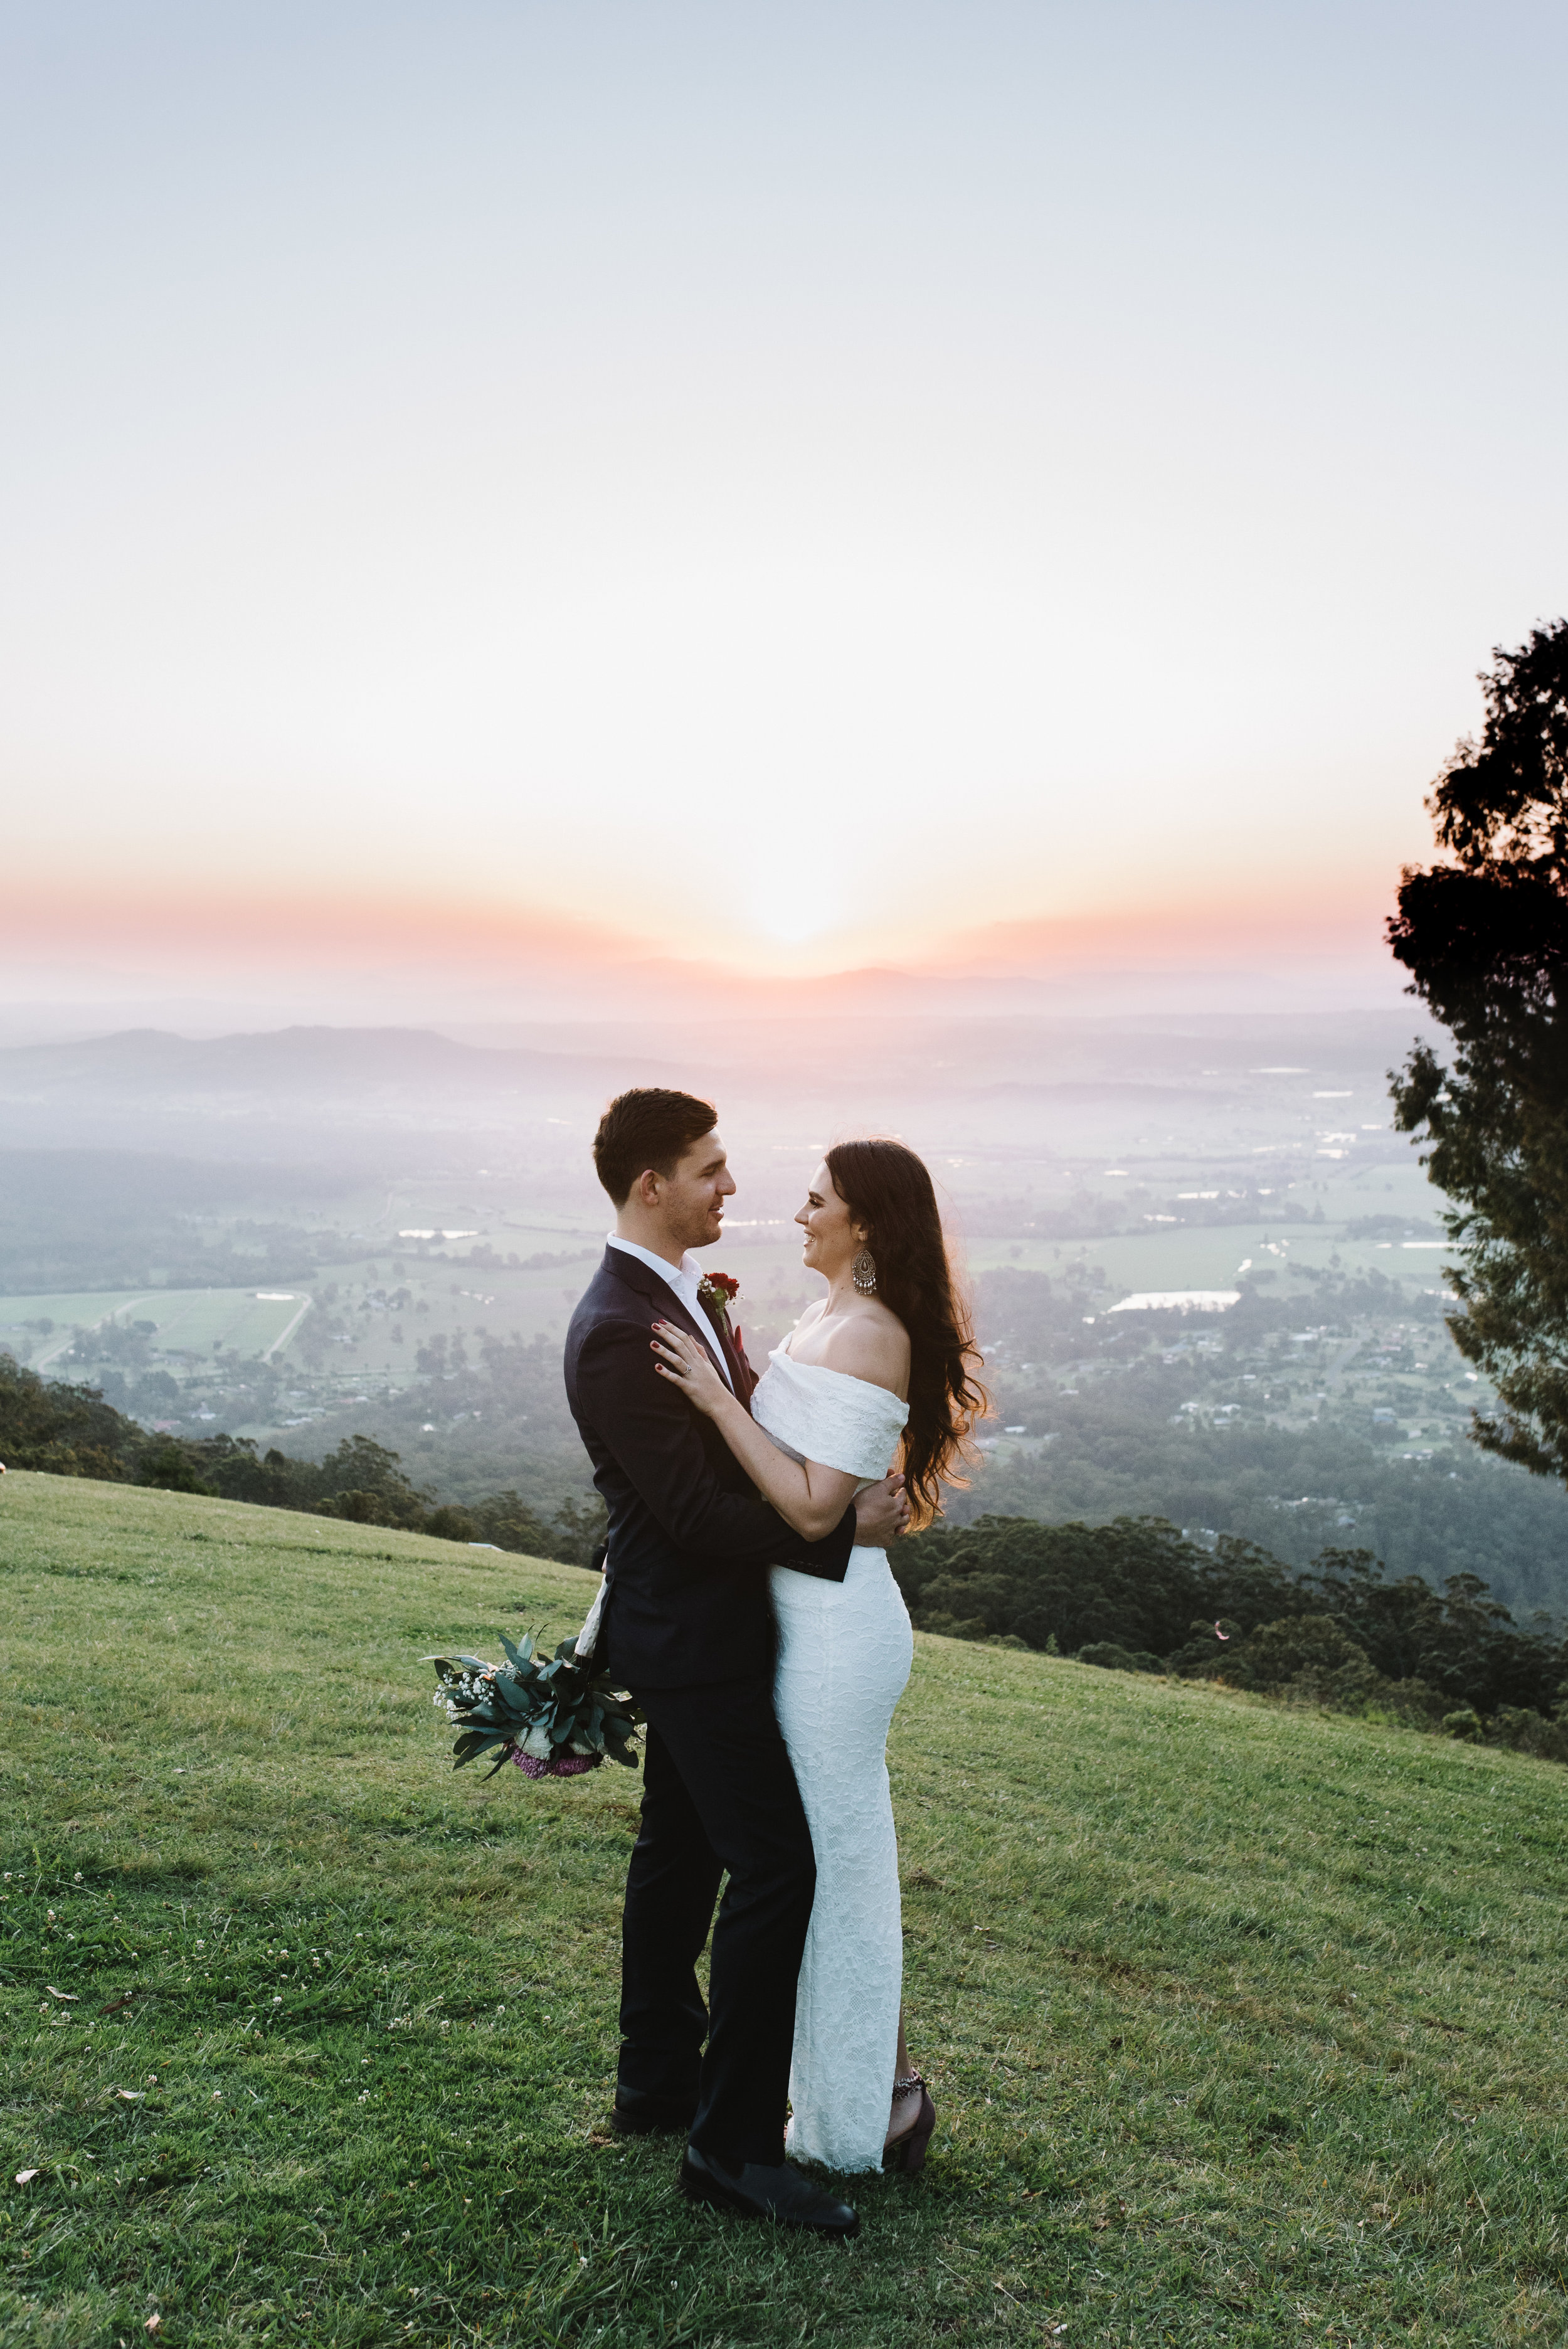 brisbane-gold-coast-sunshine-coast-wedding-photographer-mount-tamborine-wedding-1-63.jpg